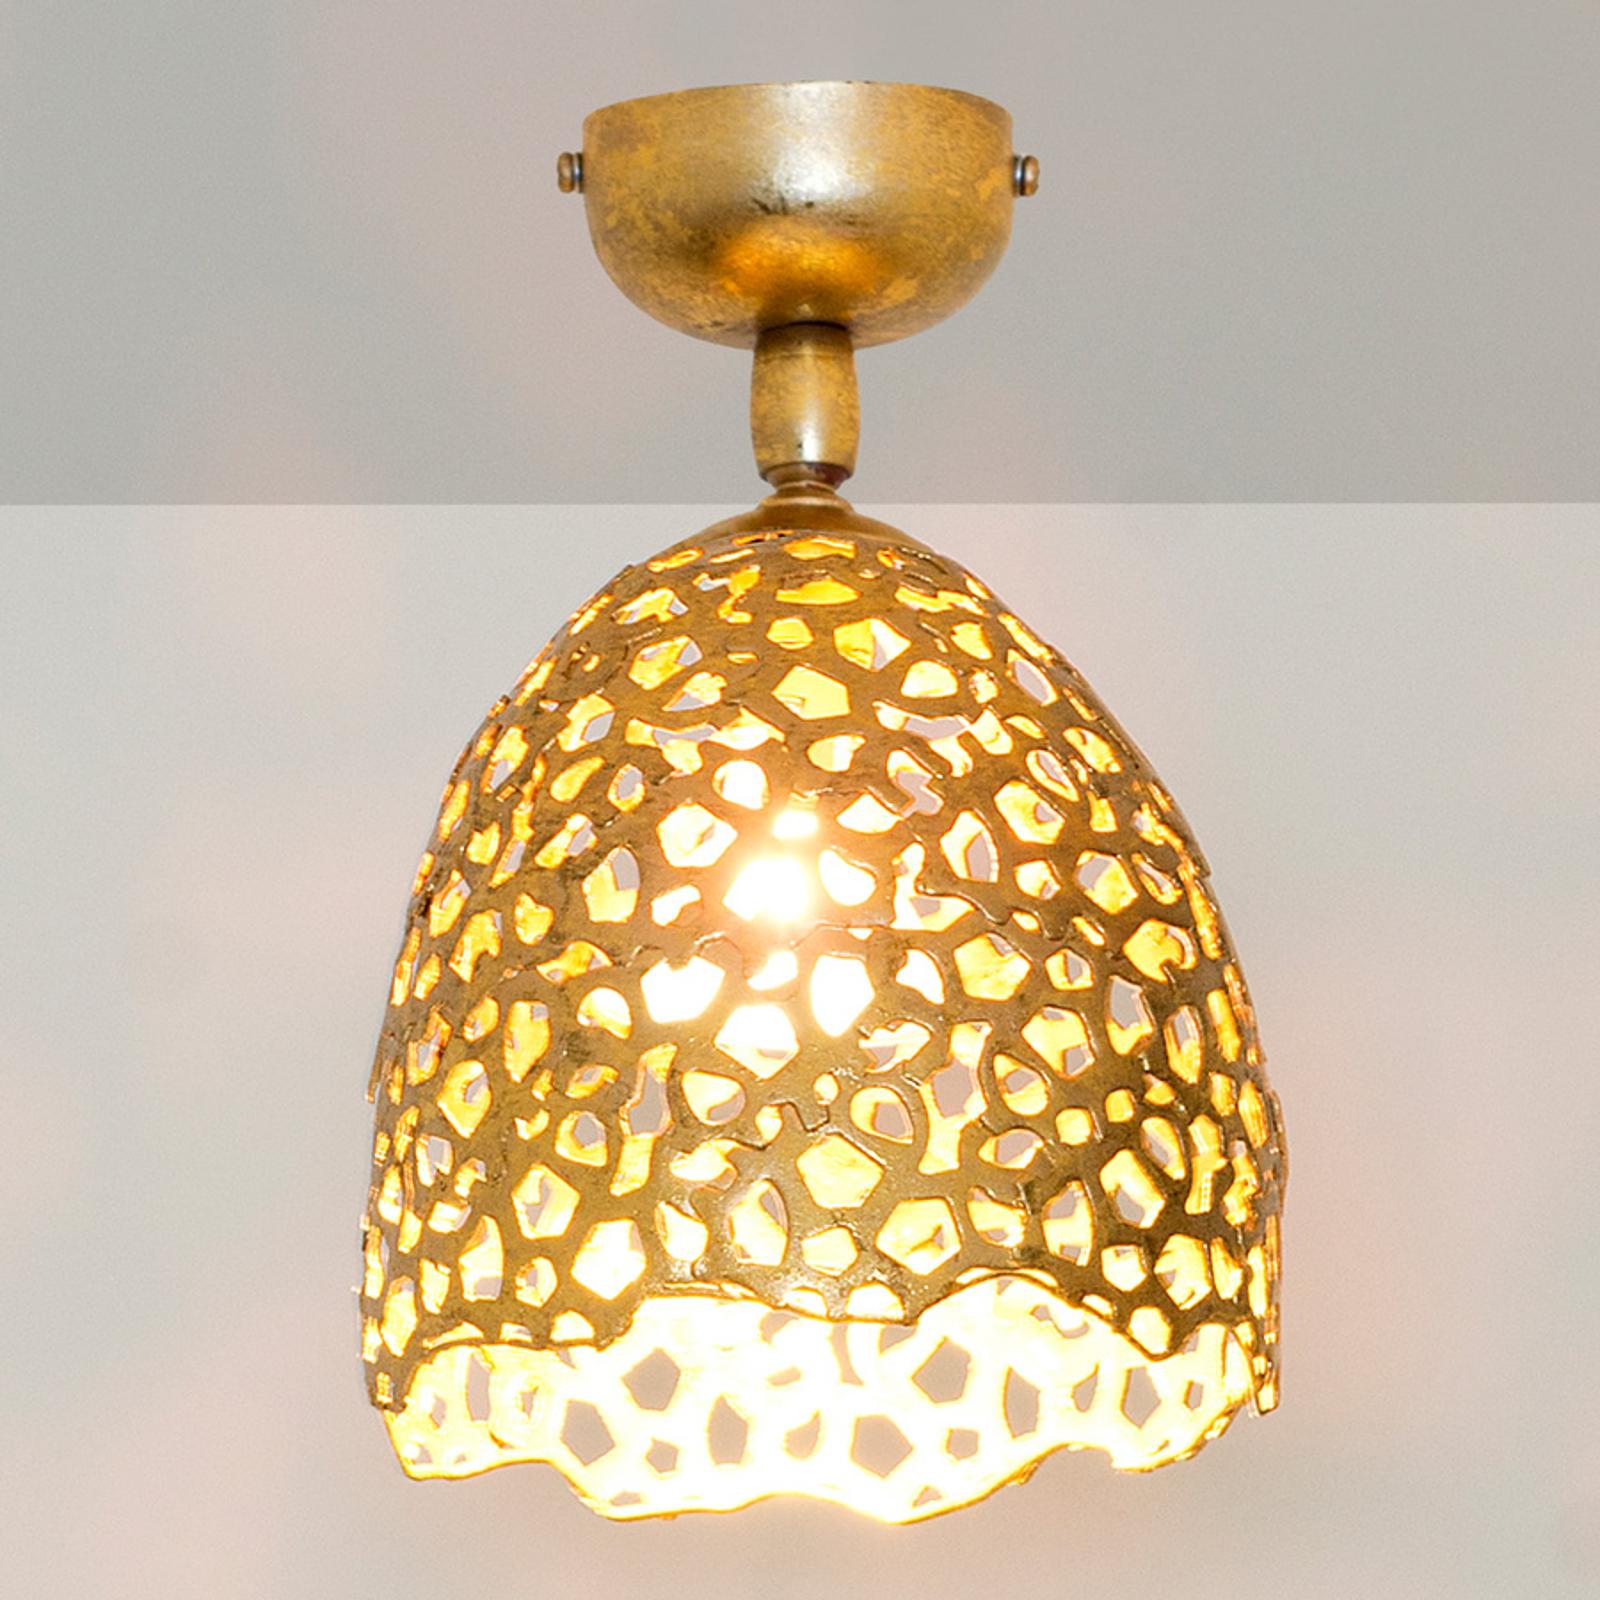 Girevole - een gebroken plafondlamp